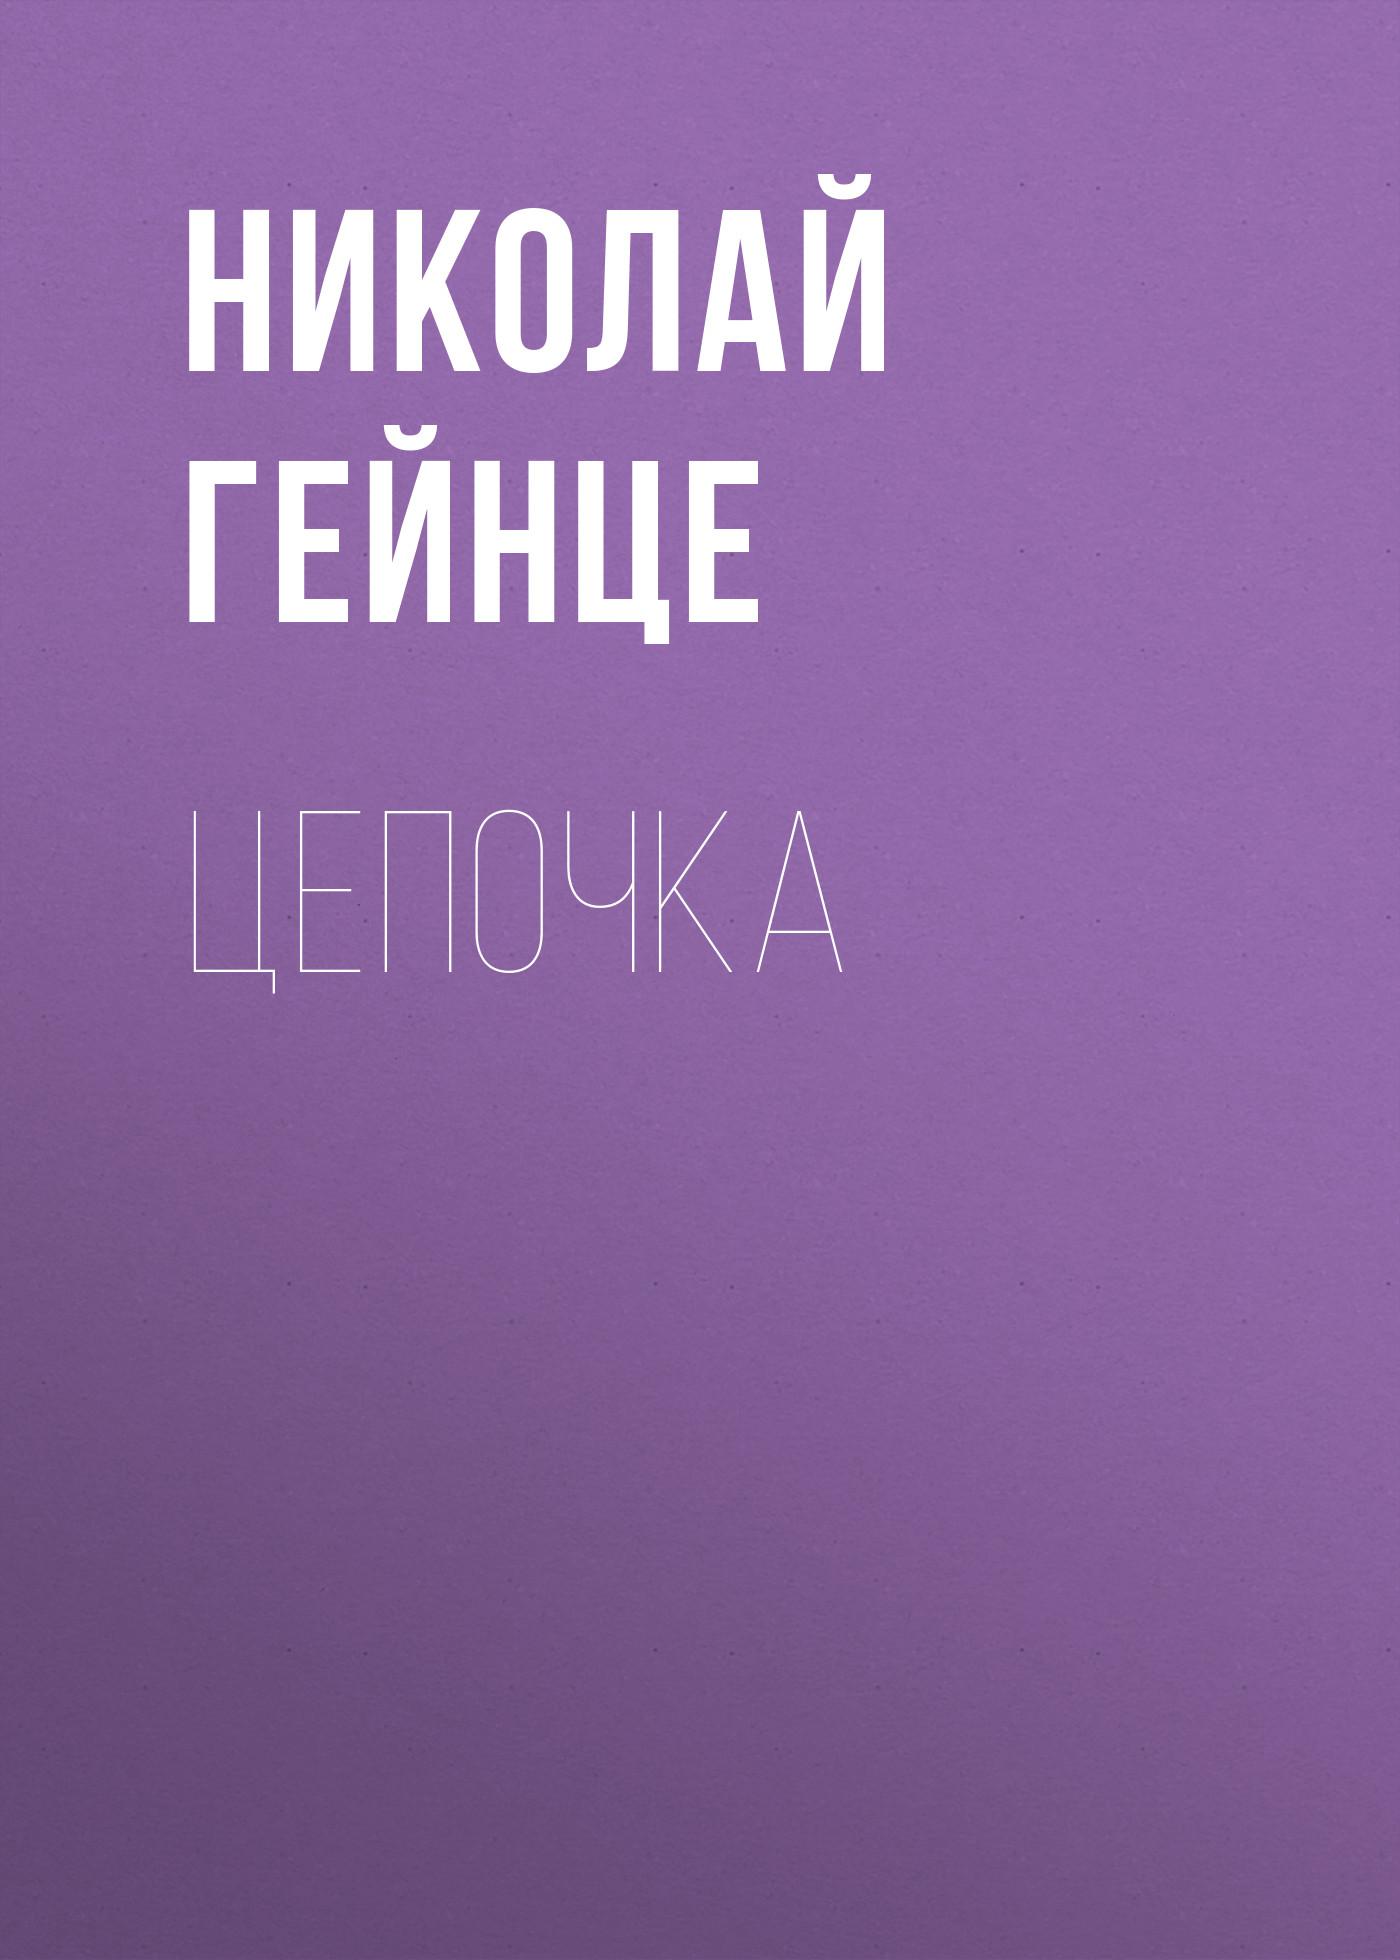 tsepochka